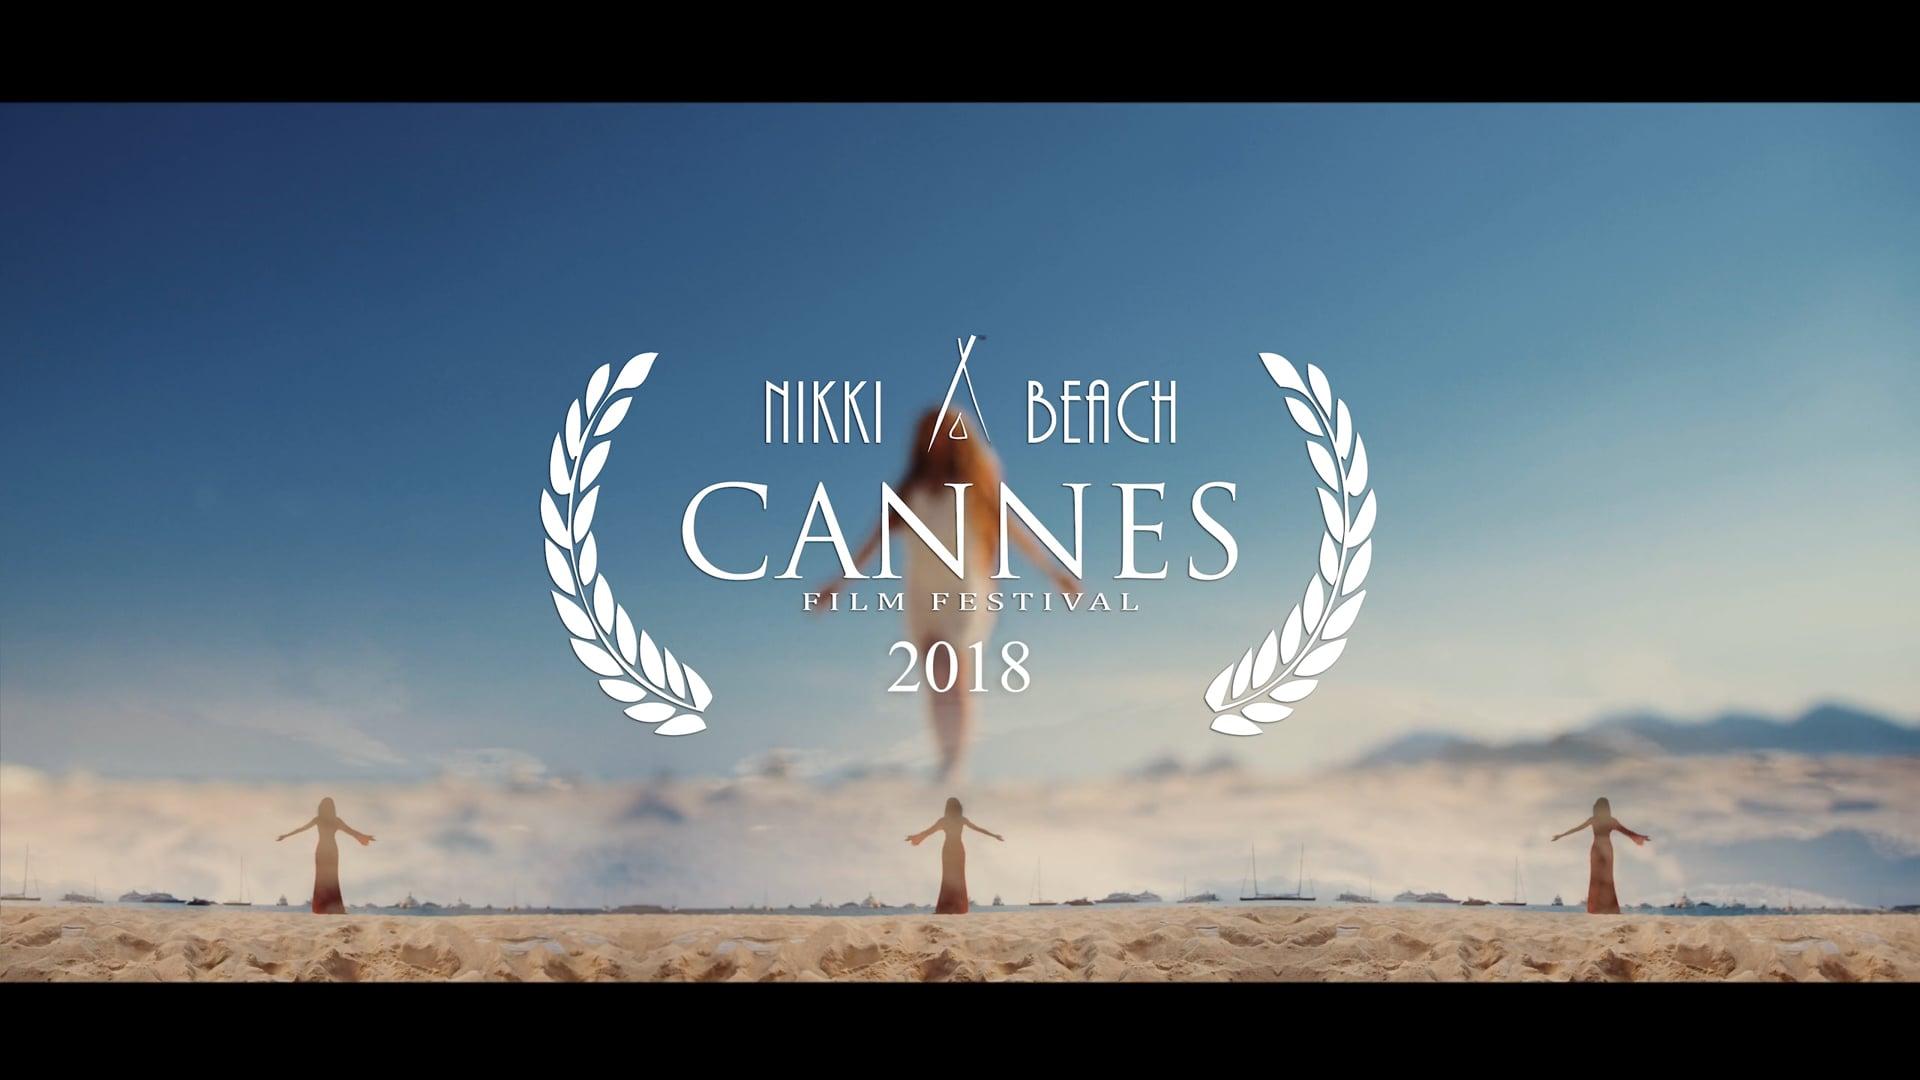 Nikki Beach Cannes 2018